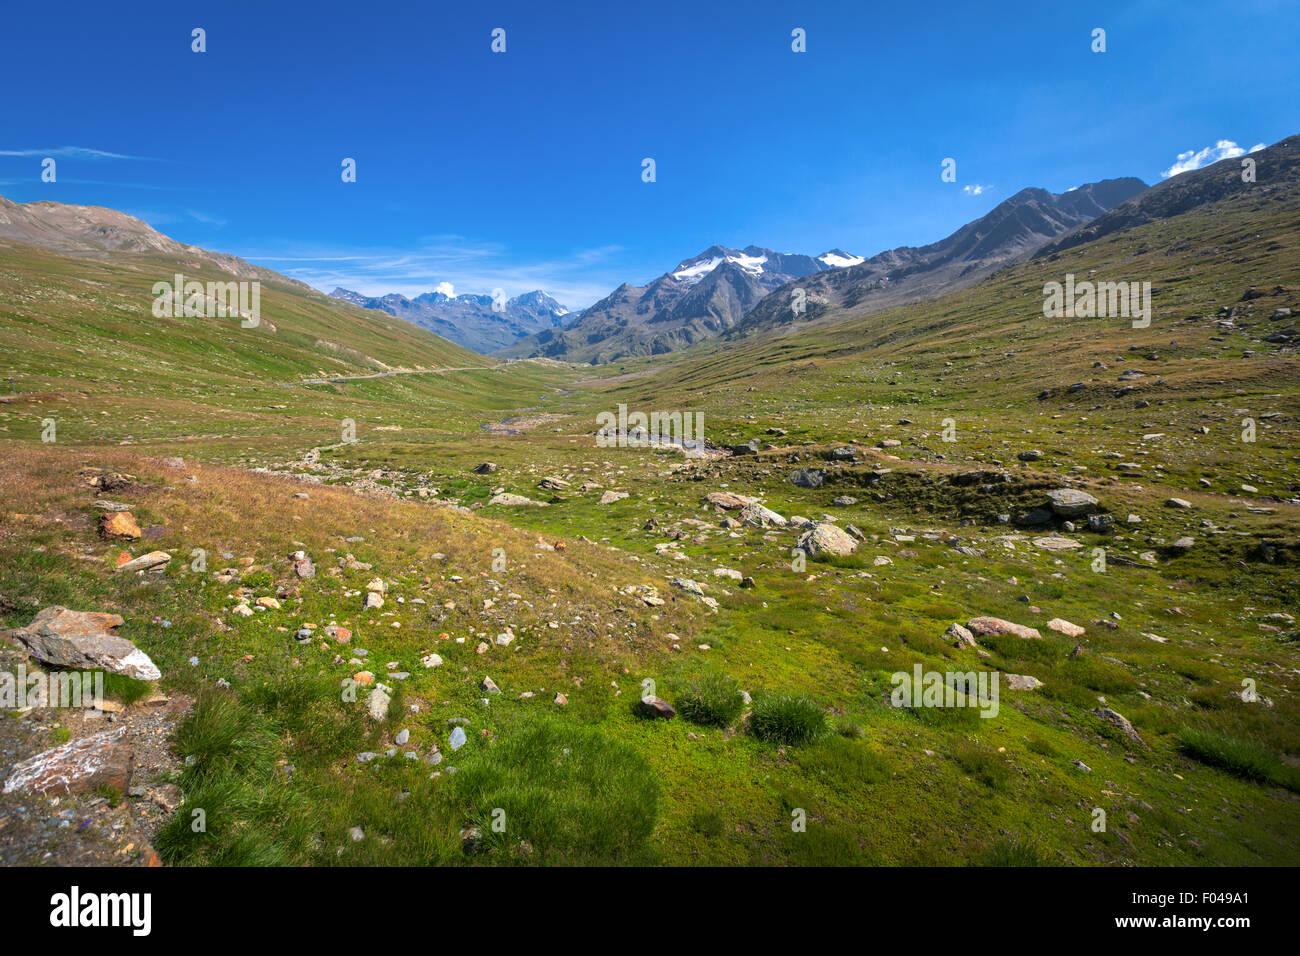 El Parque Nacional de Stelvio, Gavia Pass, Valfurva, Alpes, Italia Foto de stock